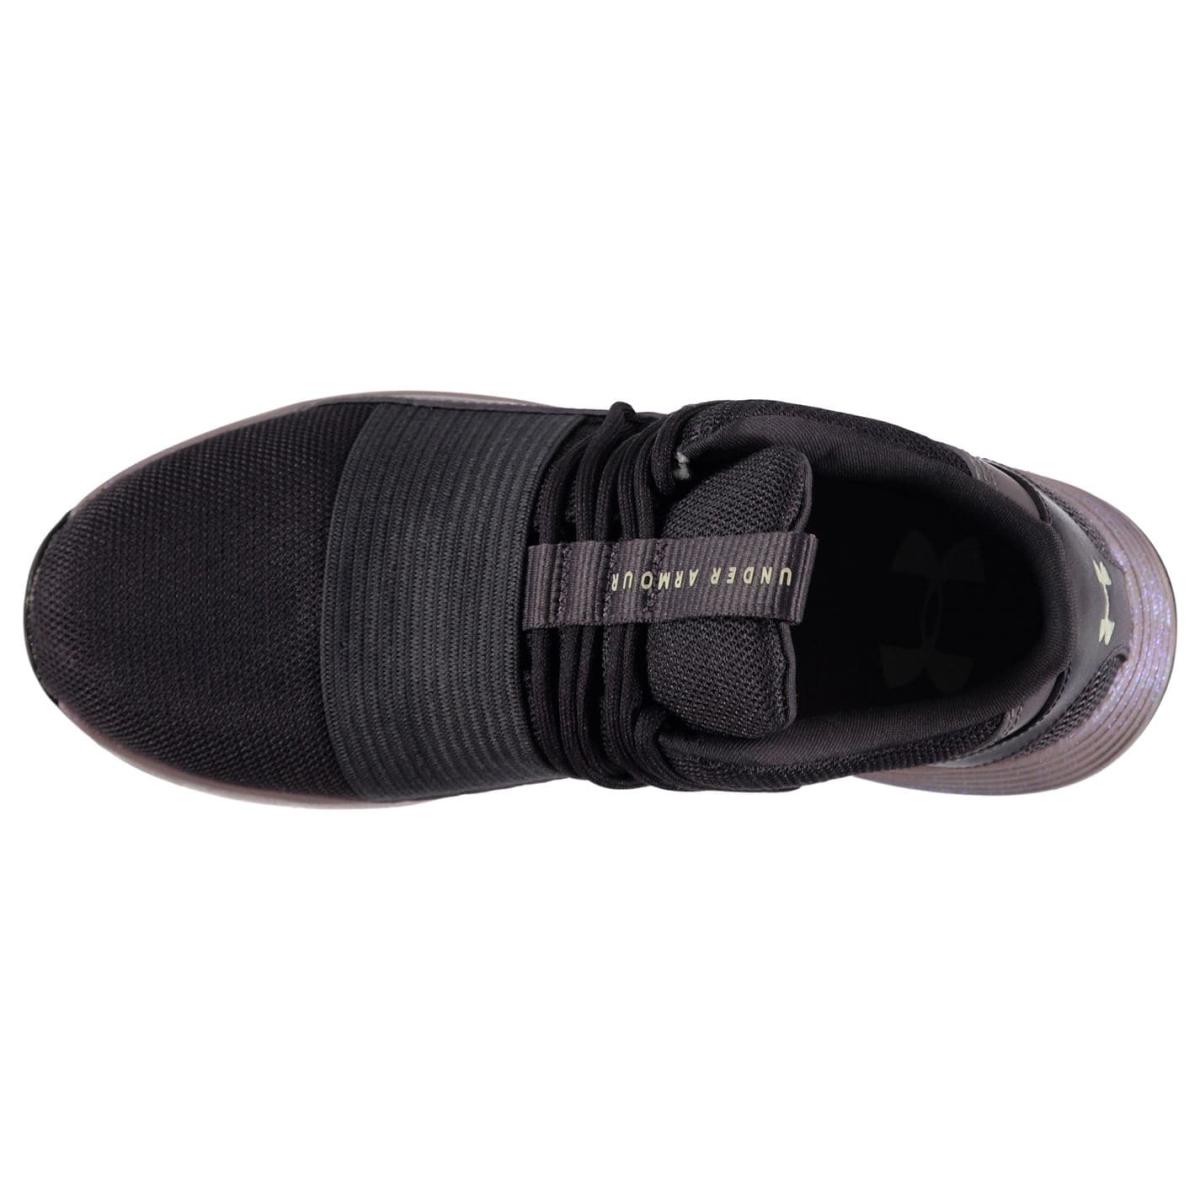 Under-Armour-Breathe-Glitz-Turnschuhe-Damen-Sneaker-Sportschuhe-Laufschuhe-1451 Indexbild 7